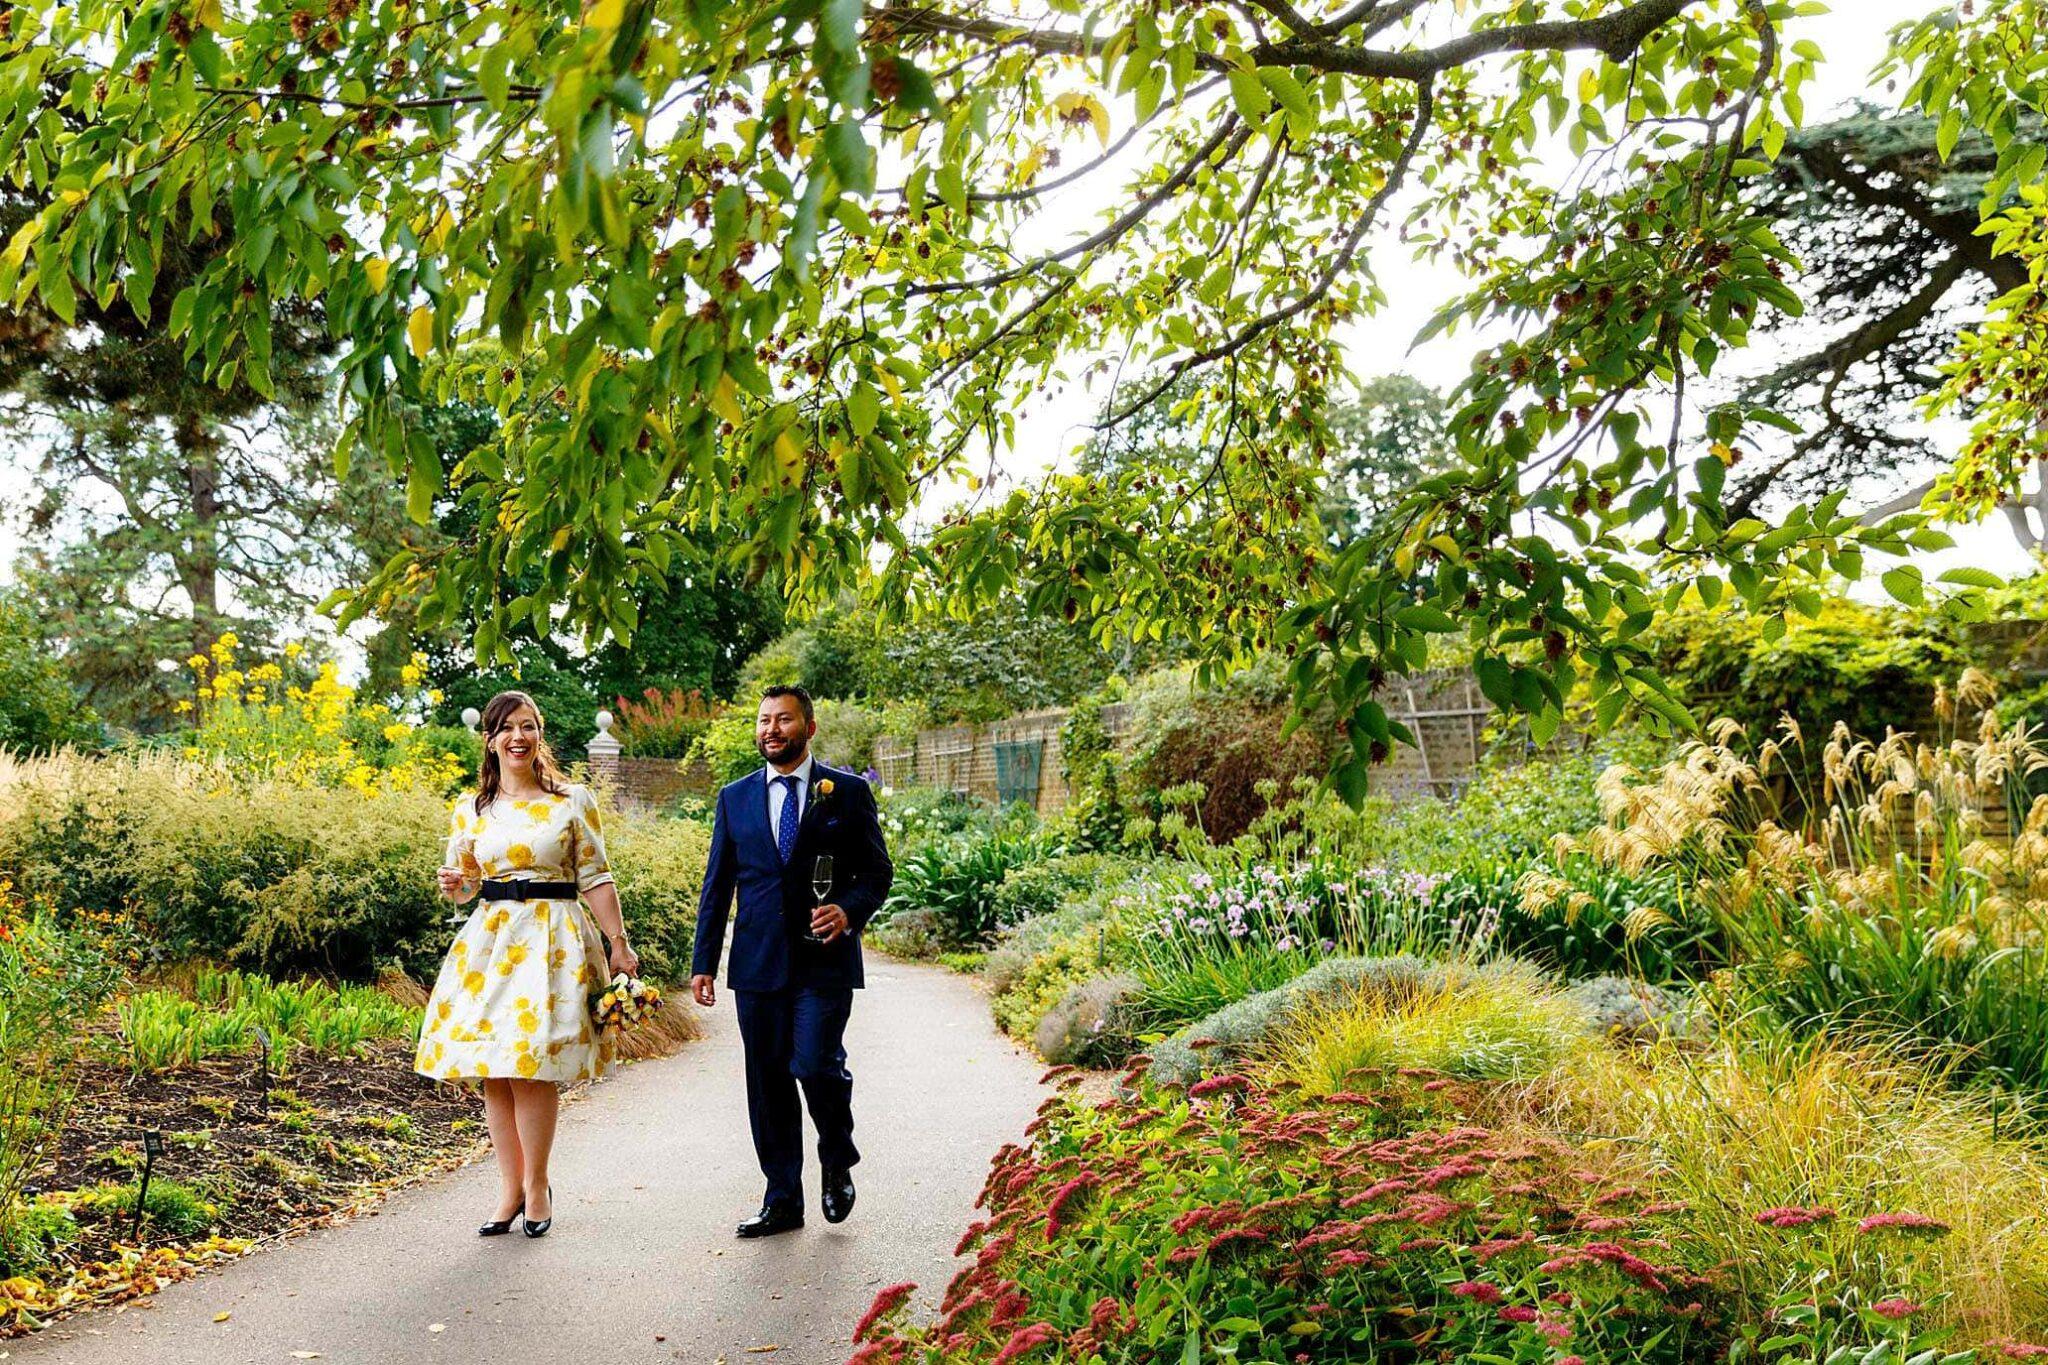 Cambridge Cottage wedding photos of Katy and Rico